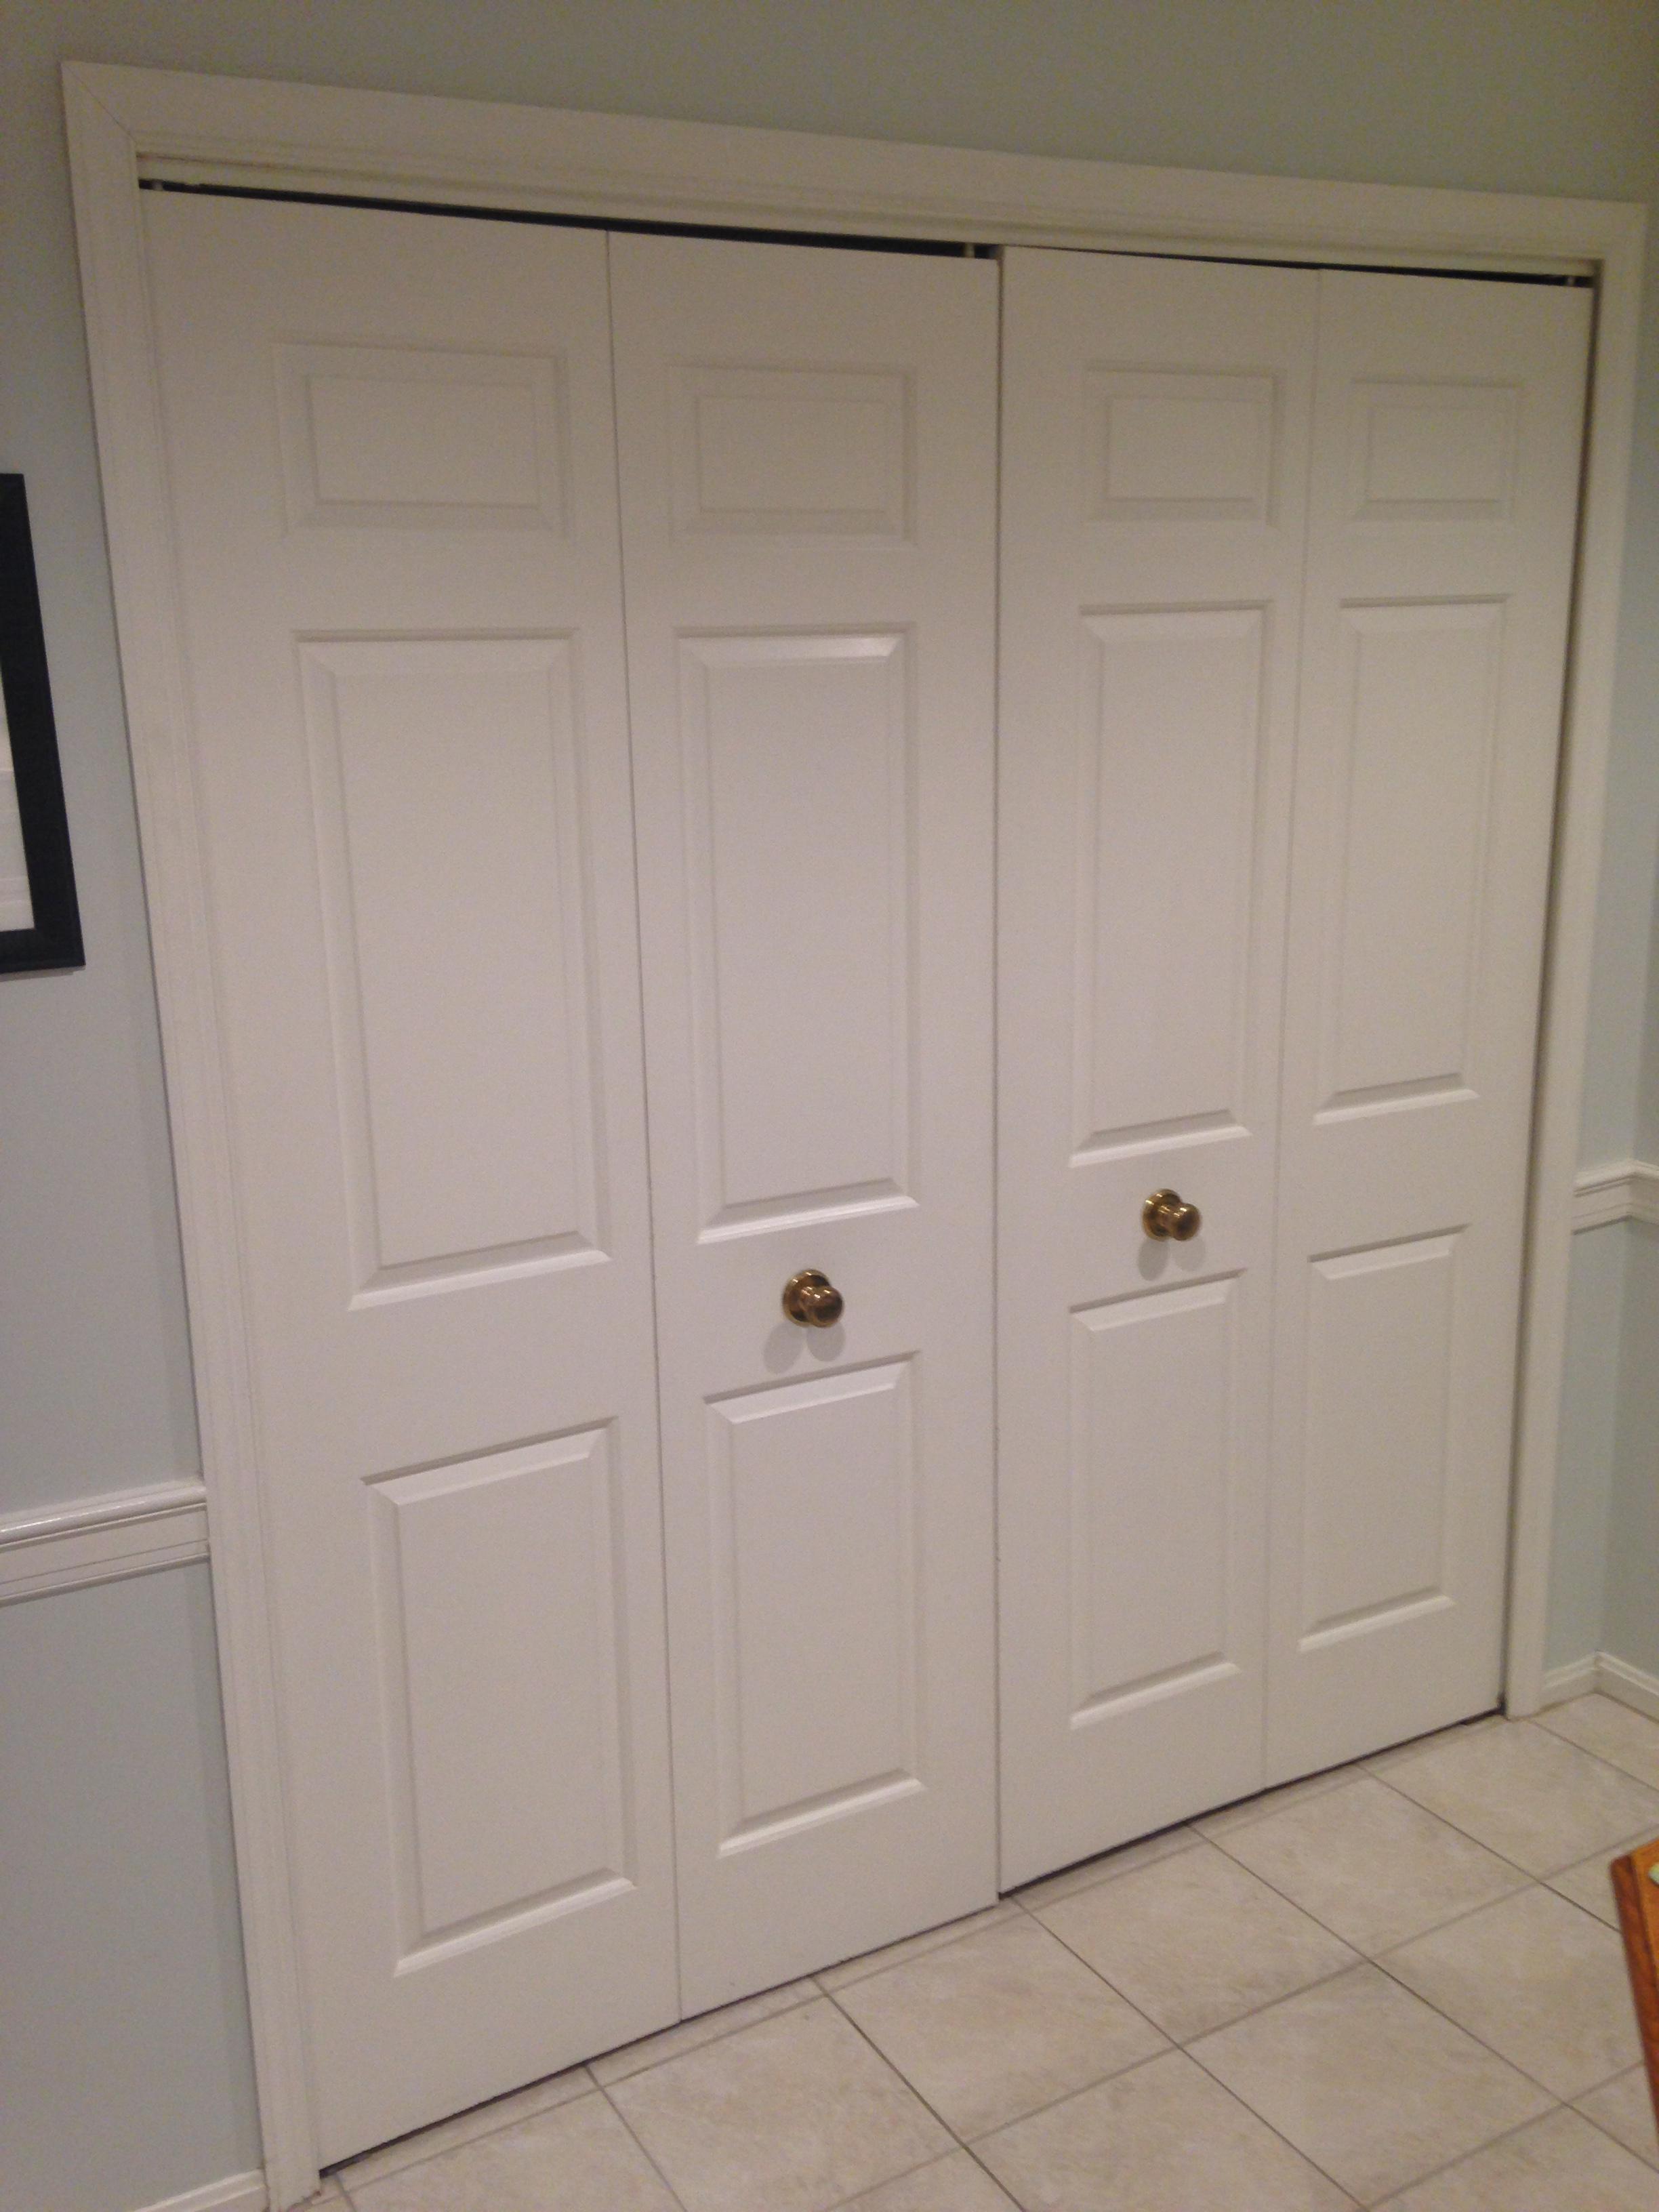 Mastering The Fine Art Of Adjusting Bifold Doors The Washington Post